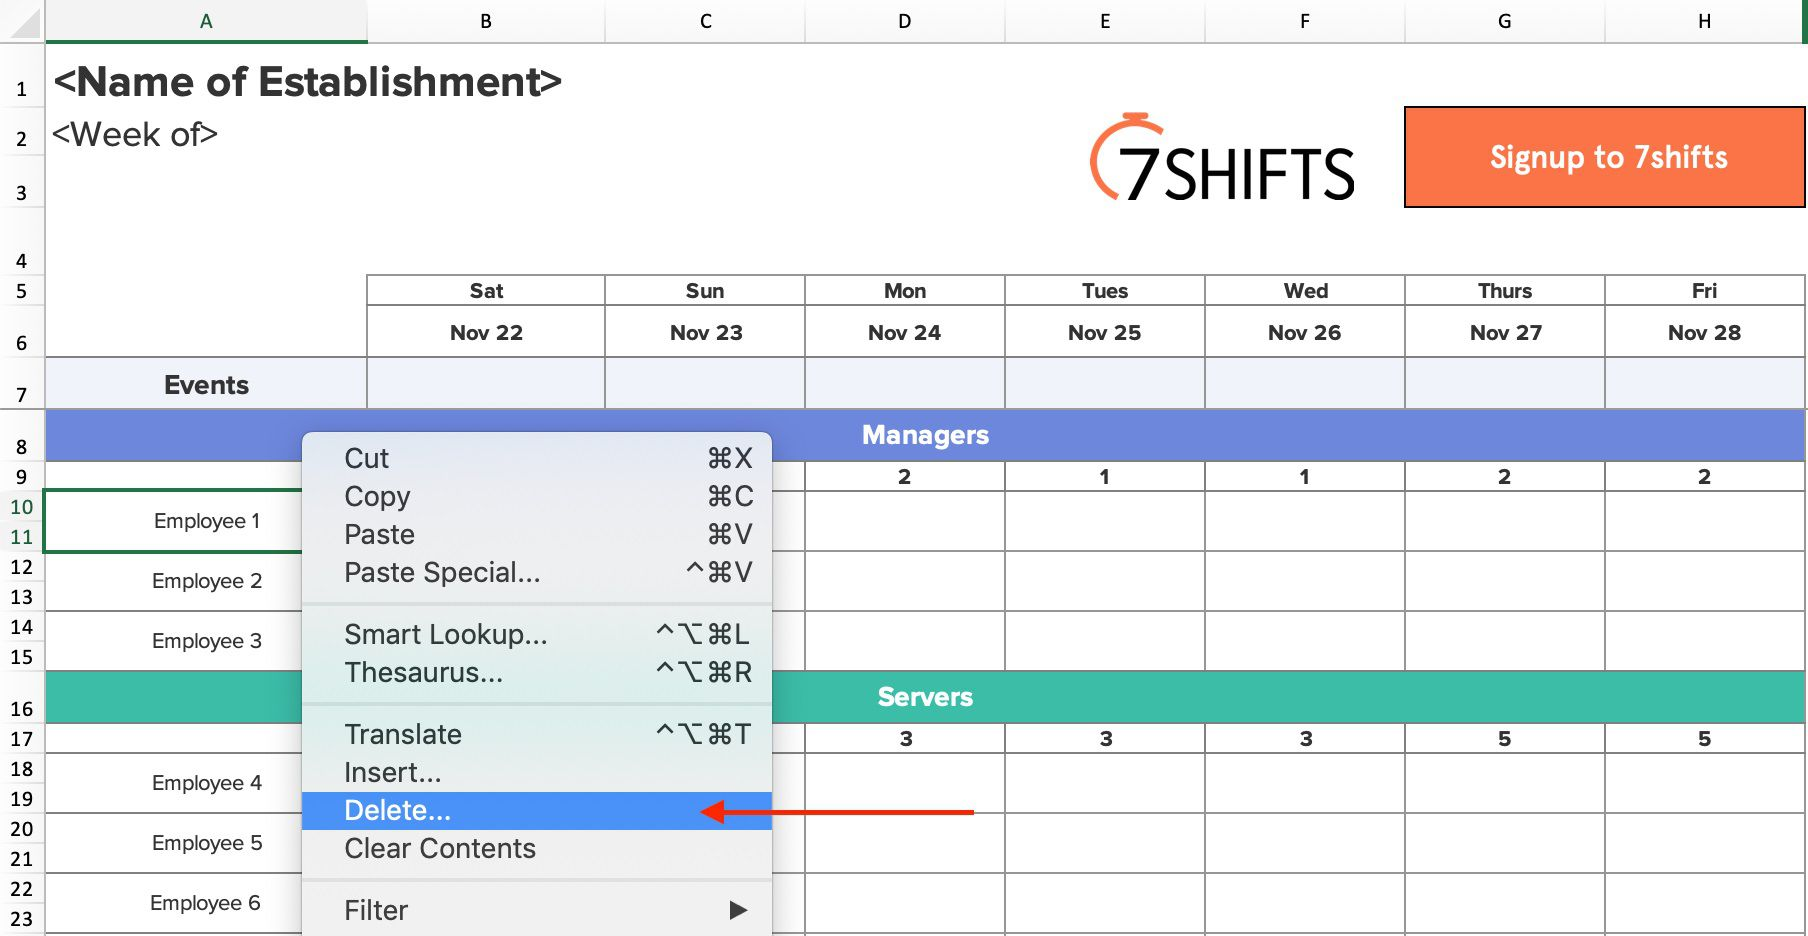 000 Outstanding Employee Shift Scheduling Template Example  Schedule Google Sheet Work Plan Word Weekly Excel FreeFull